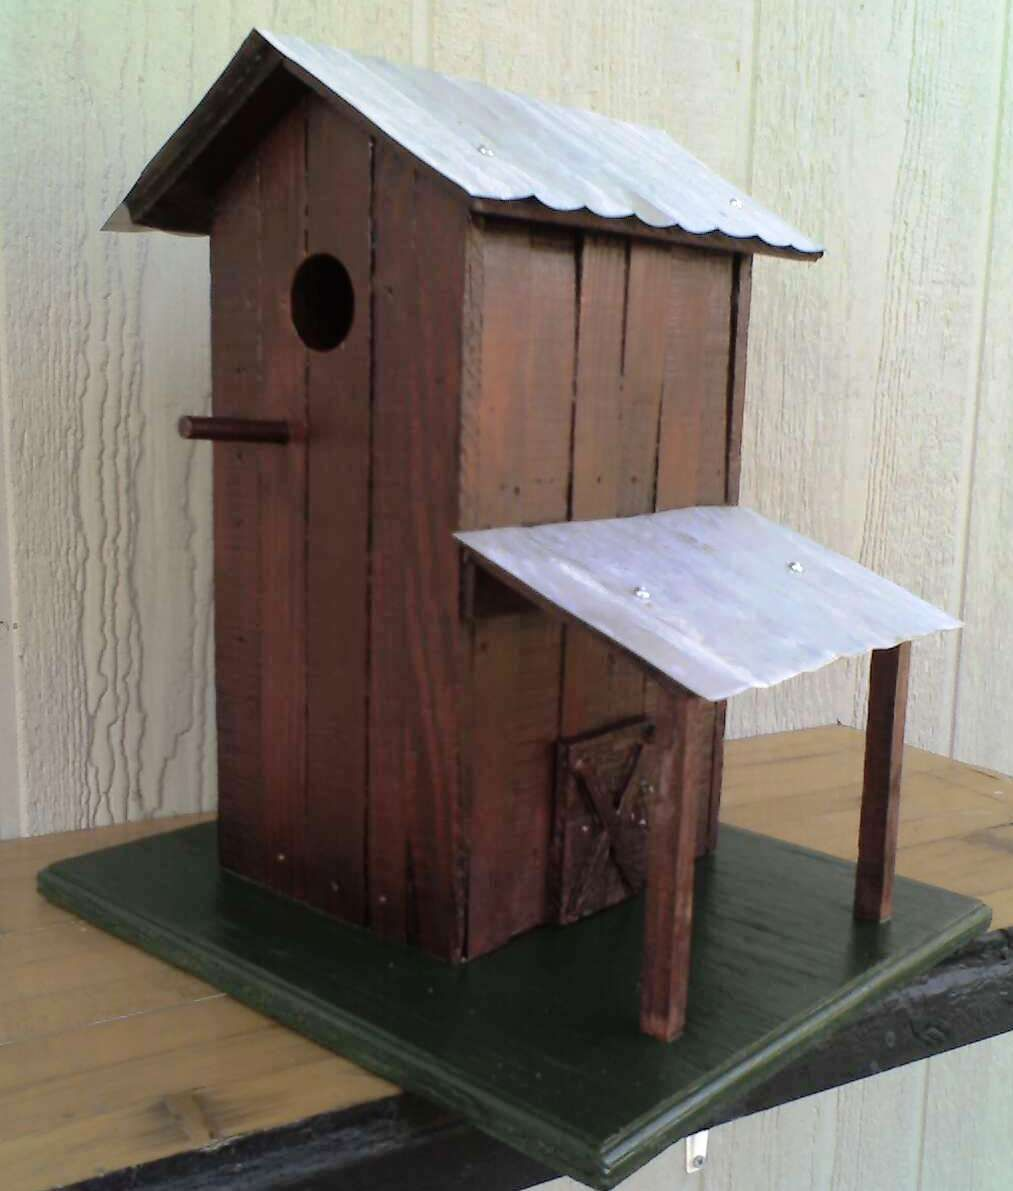 South Carolina Style Tobacco Barn Birdhouse Built Using 70 100 Year Old Sticks